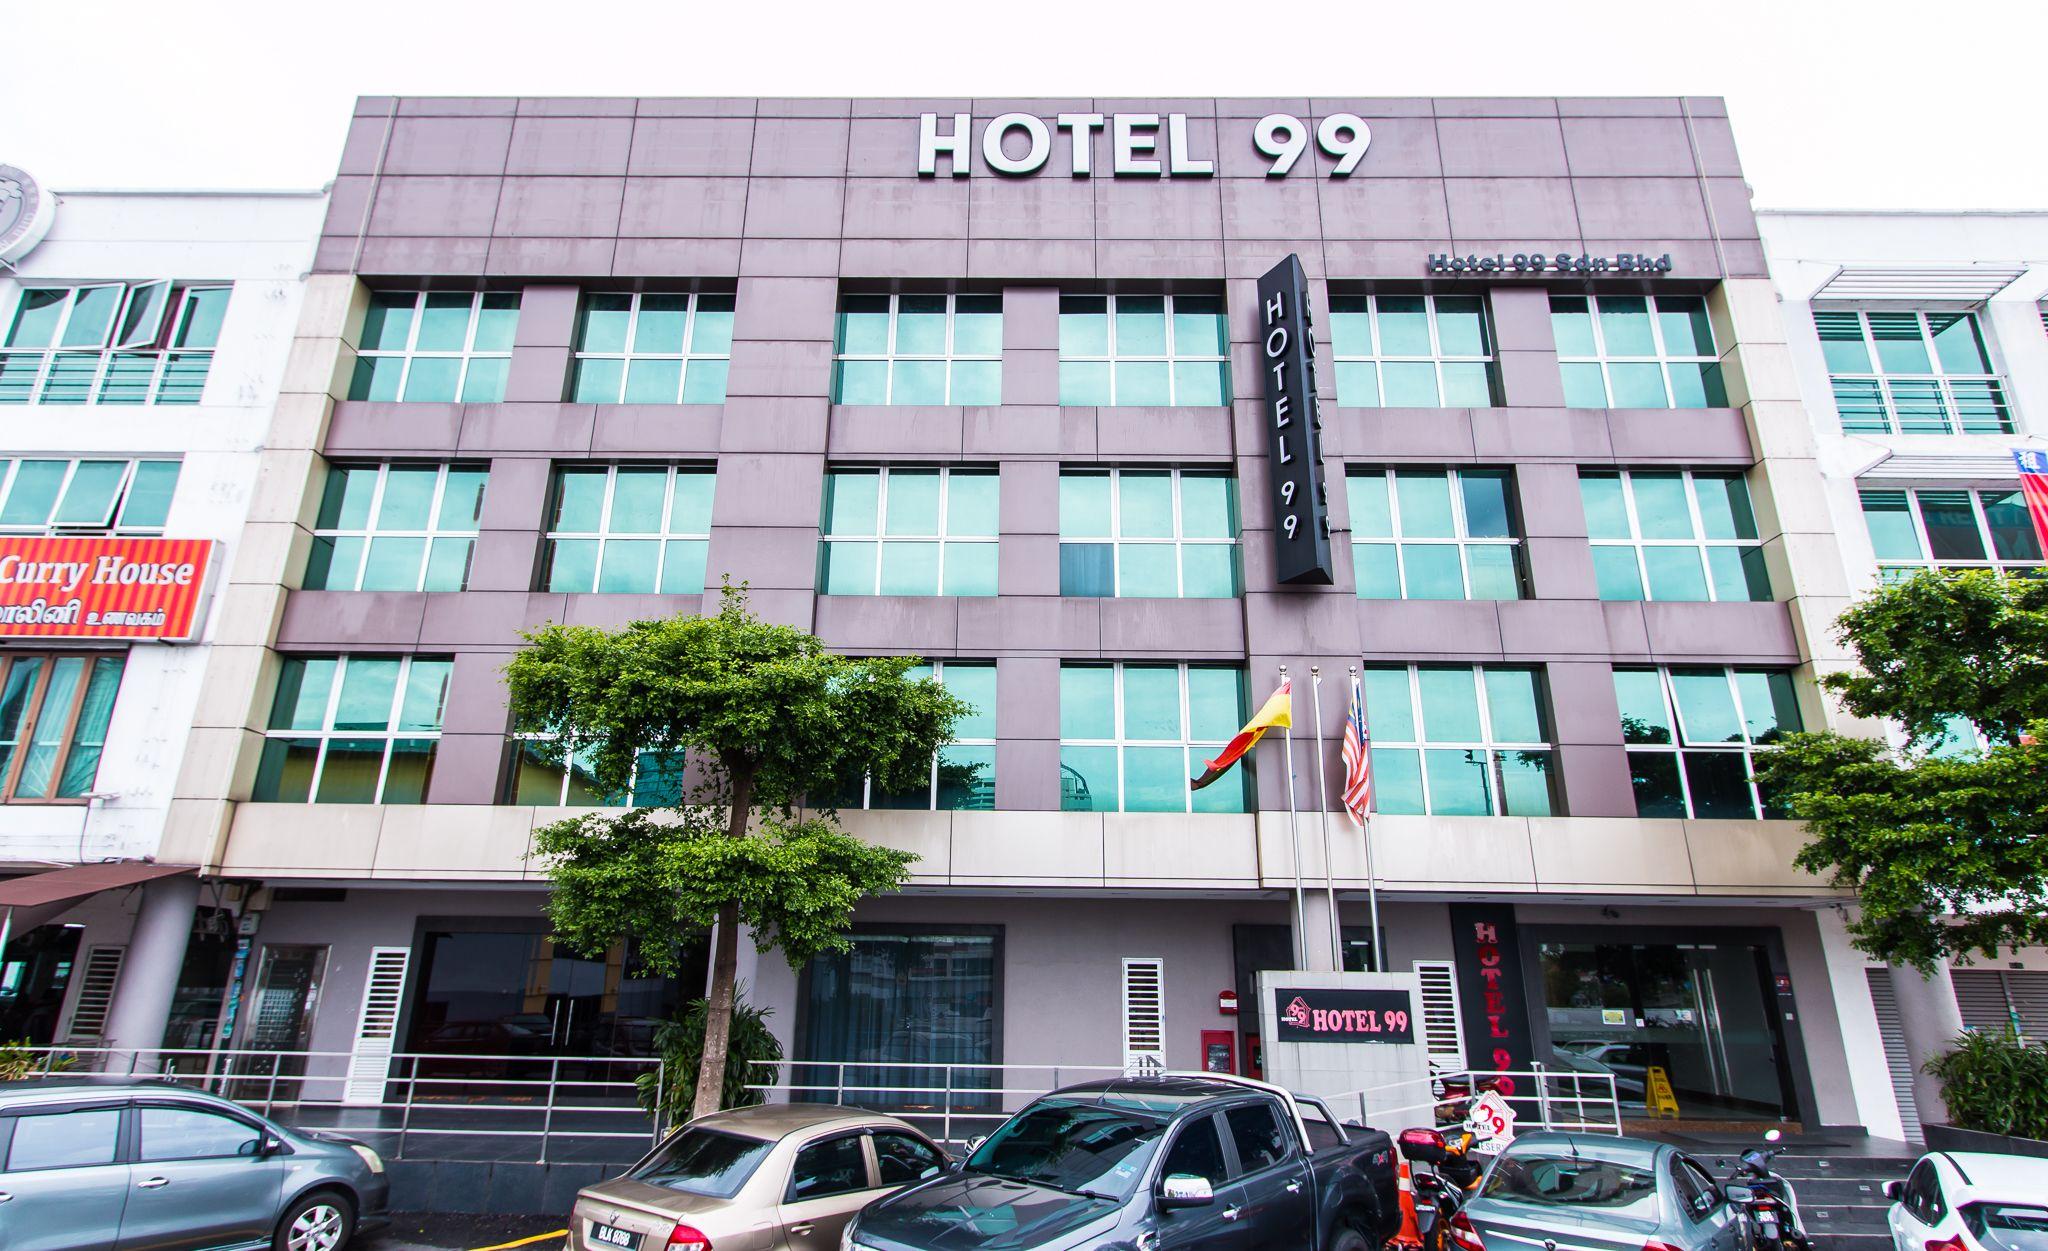 Hotel 99 Bandar Puteri Puchong, Kuala Lumpur